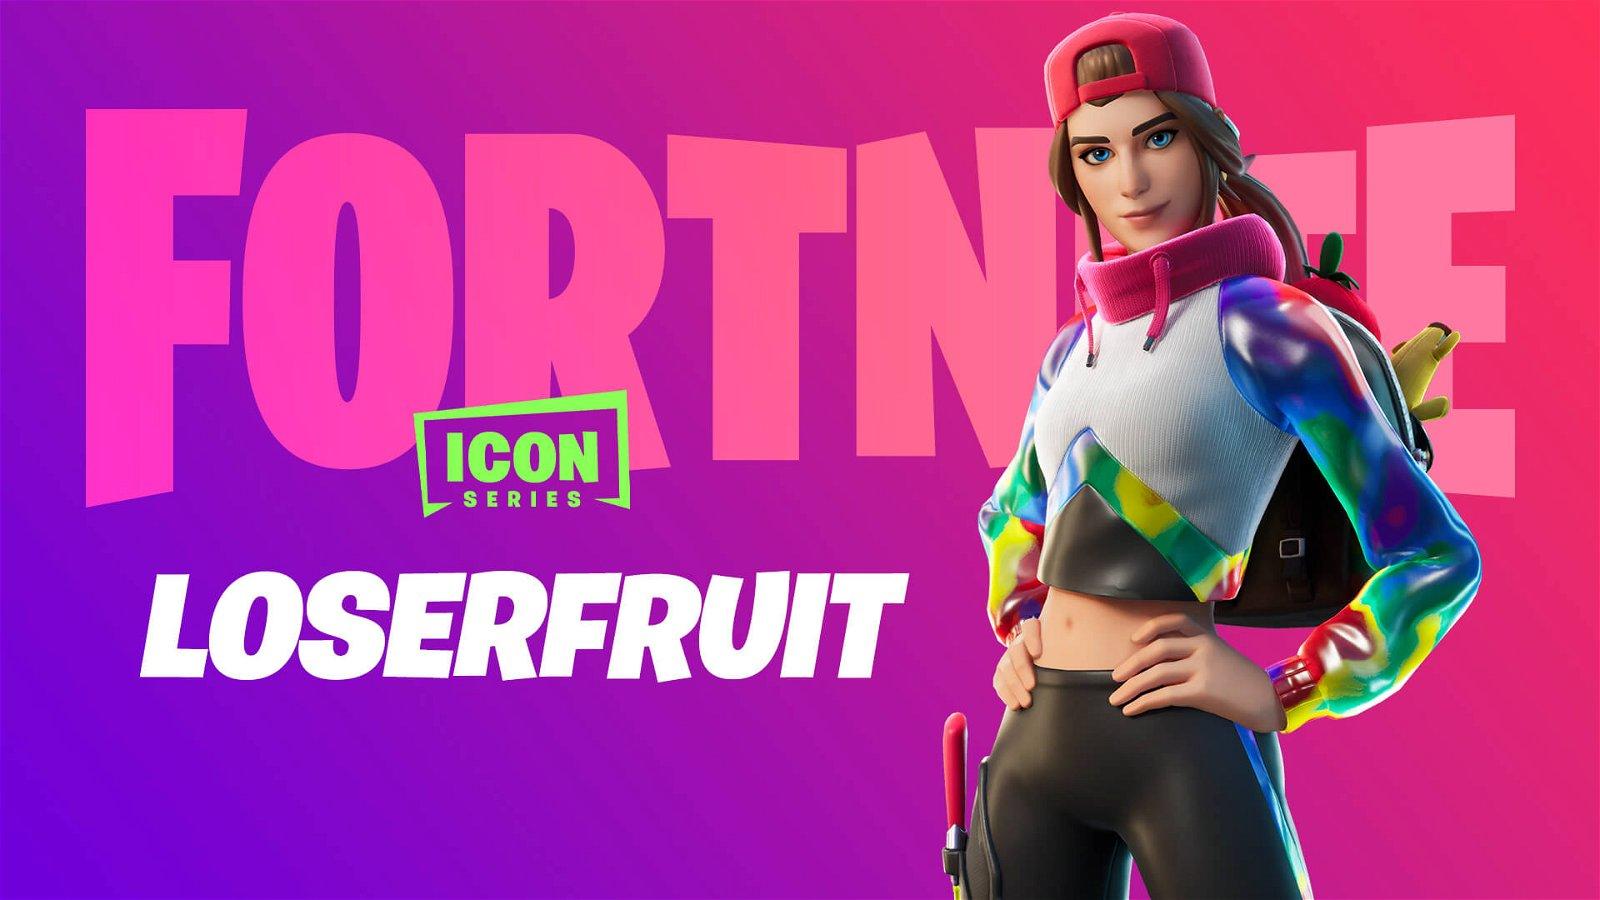 Fortnite Icon Loserfruit